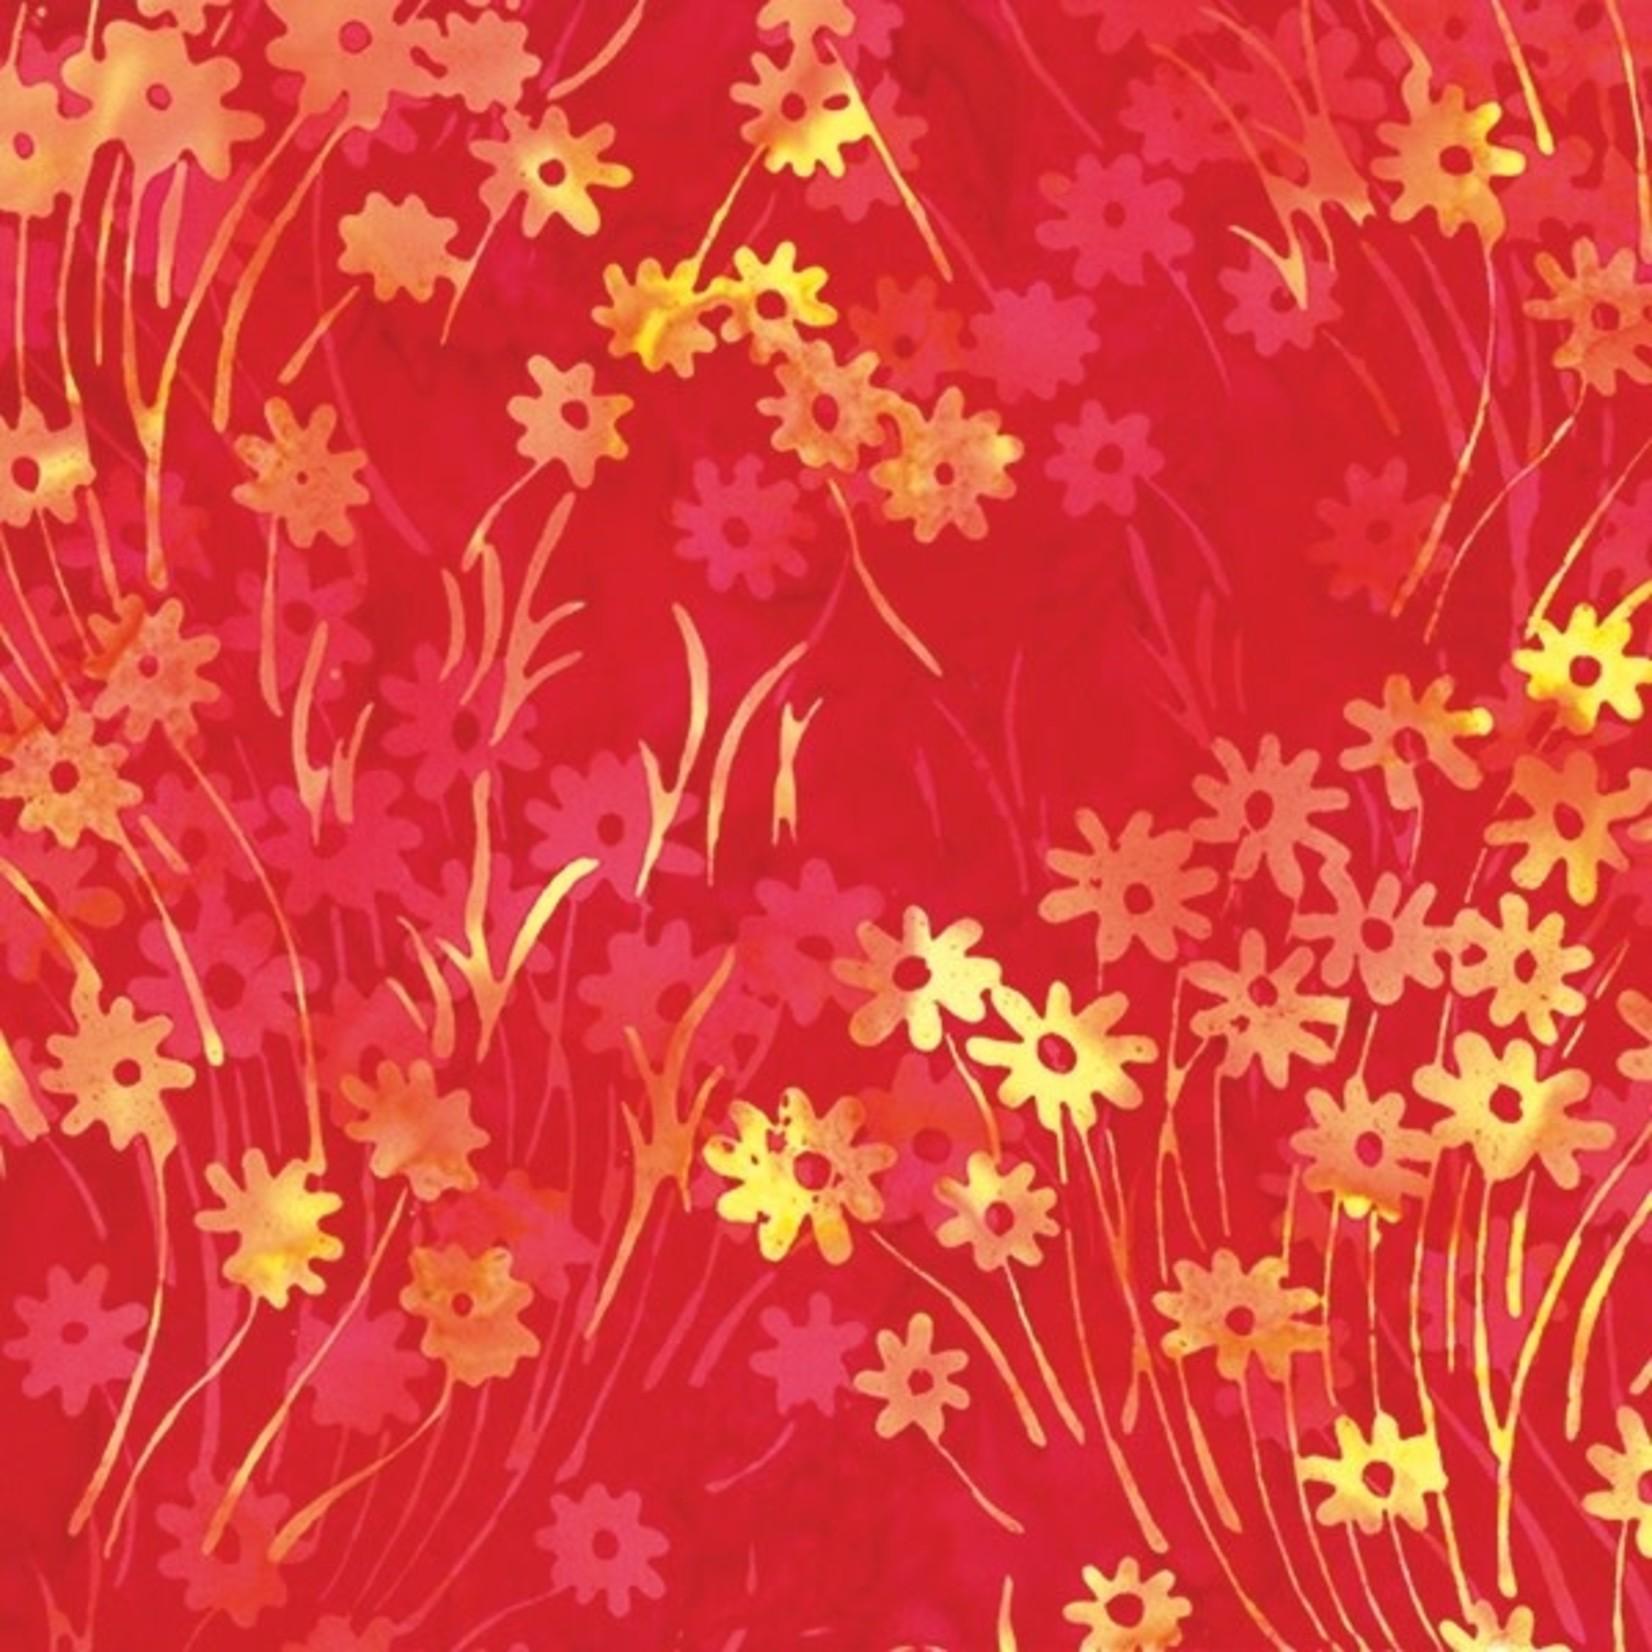 Hoffman Fabrics Bali Handpaints - Chilies